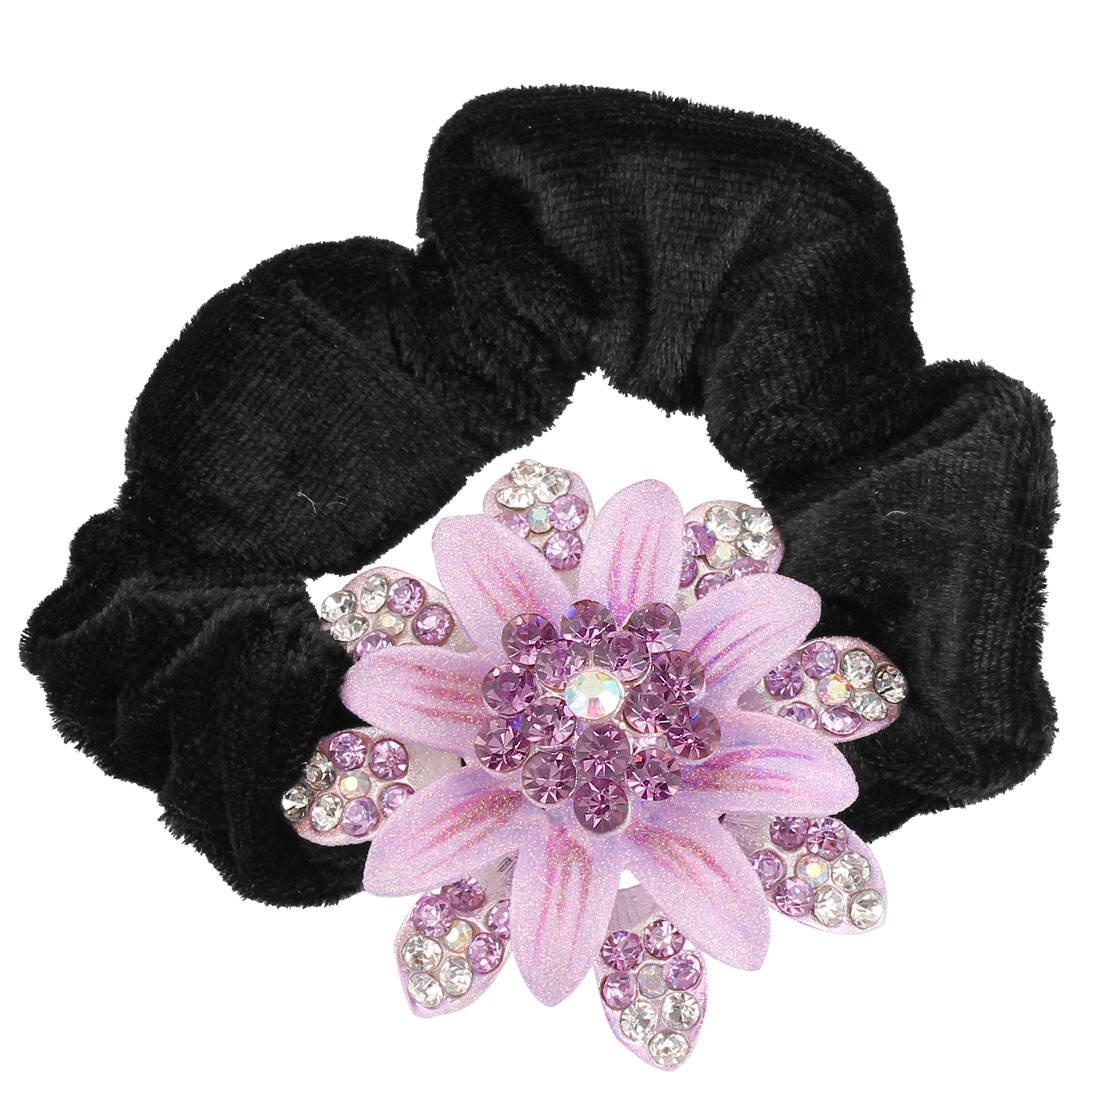 Glittery Faux Rhinestone Purple Silver Tone Flower Black Velvet Ponytail Holder